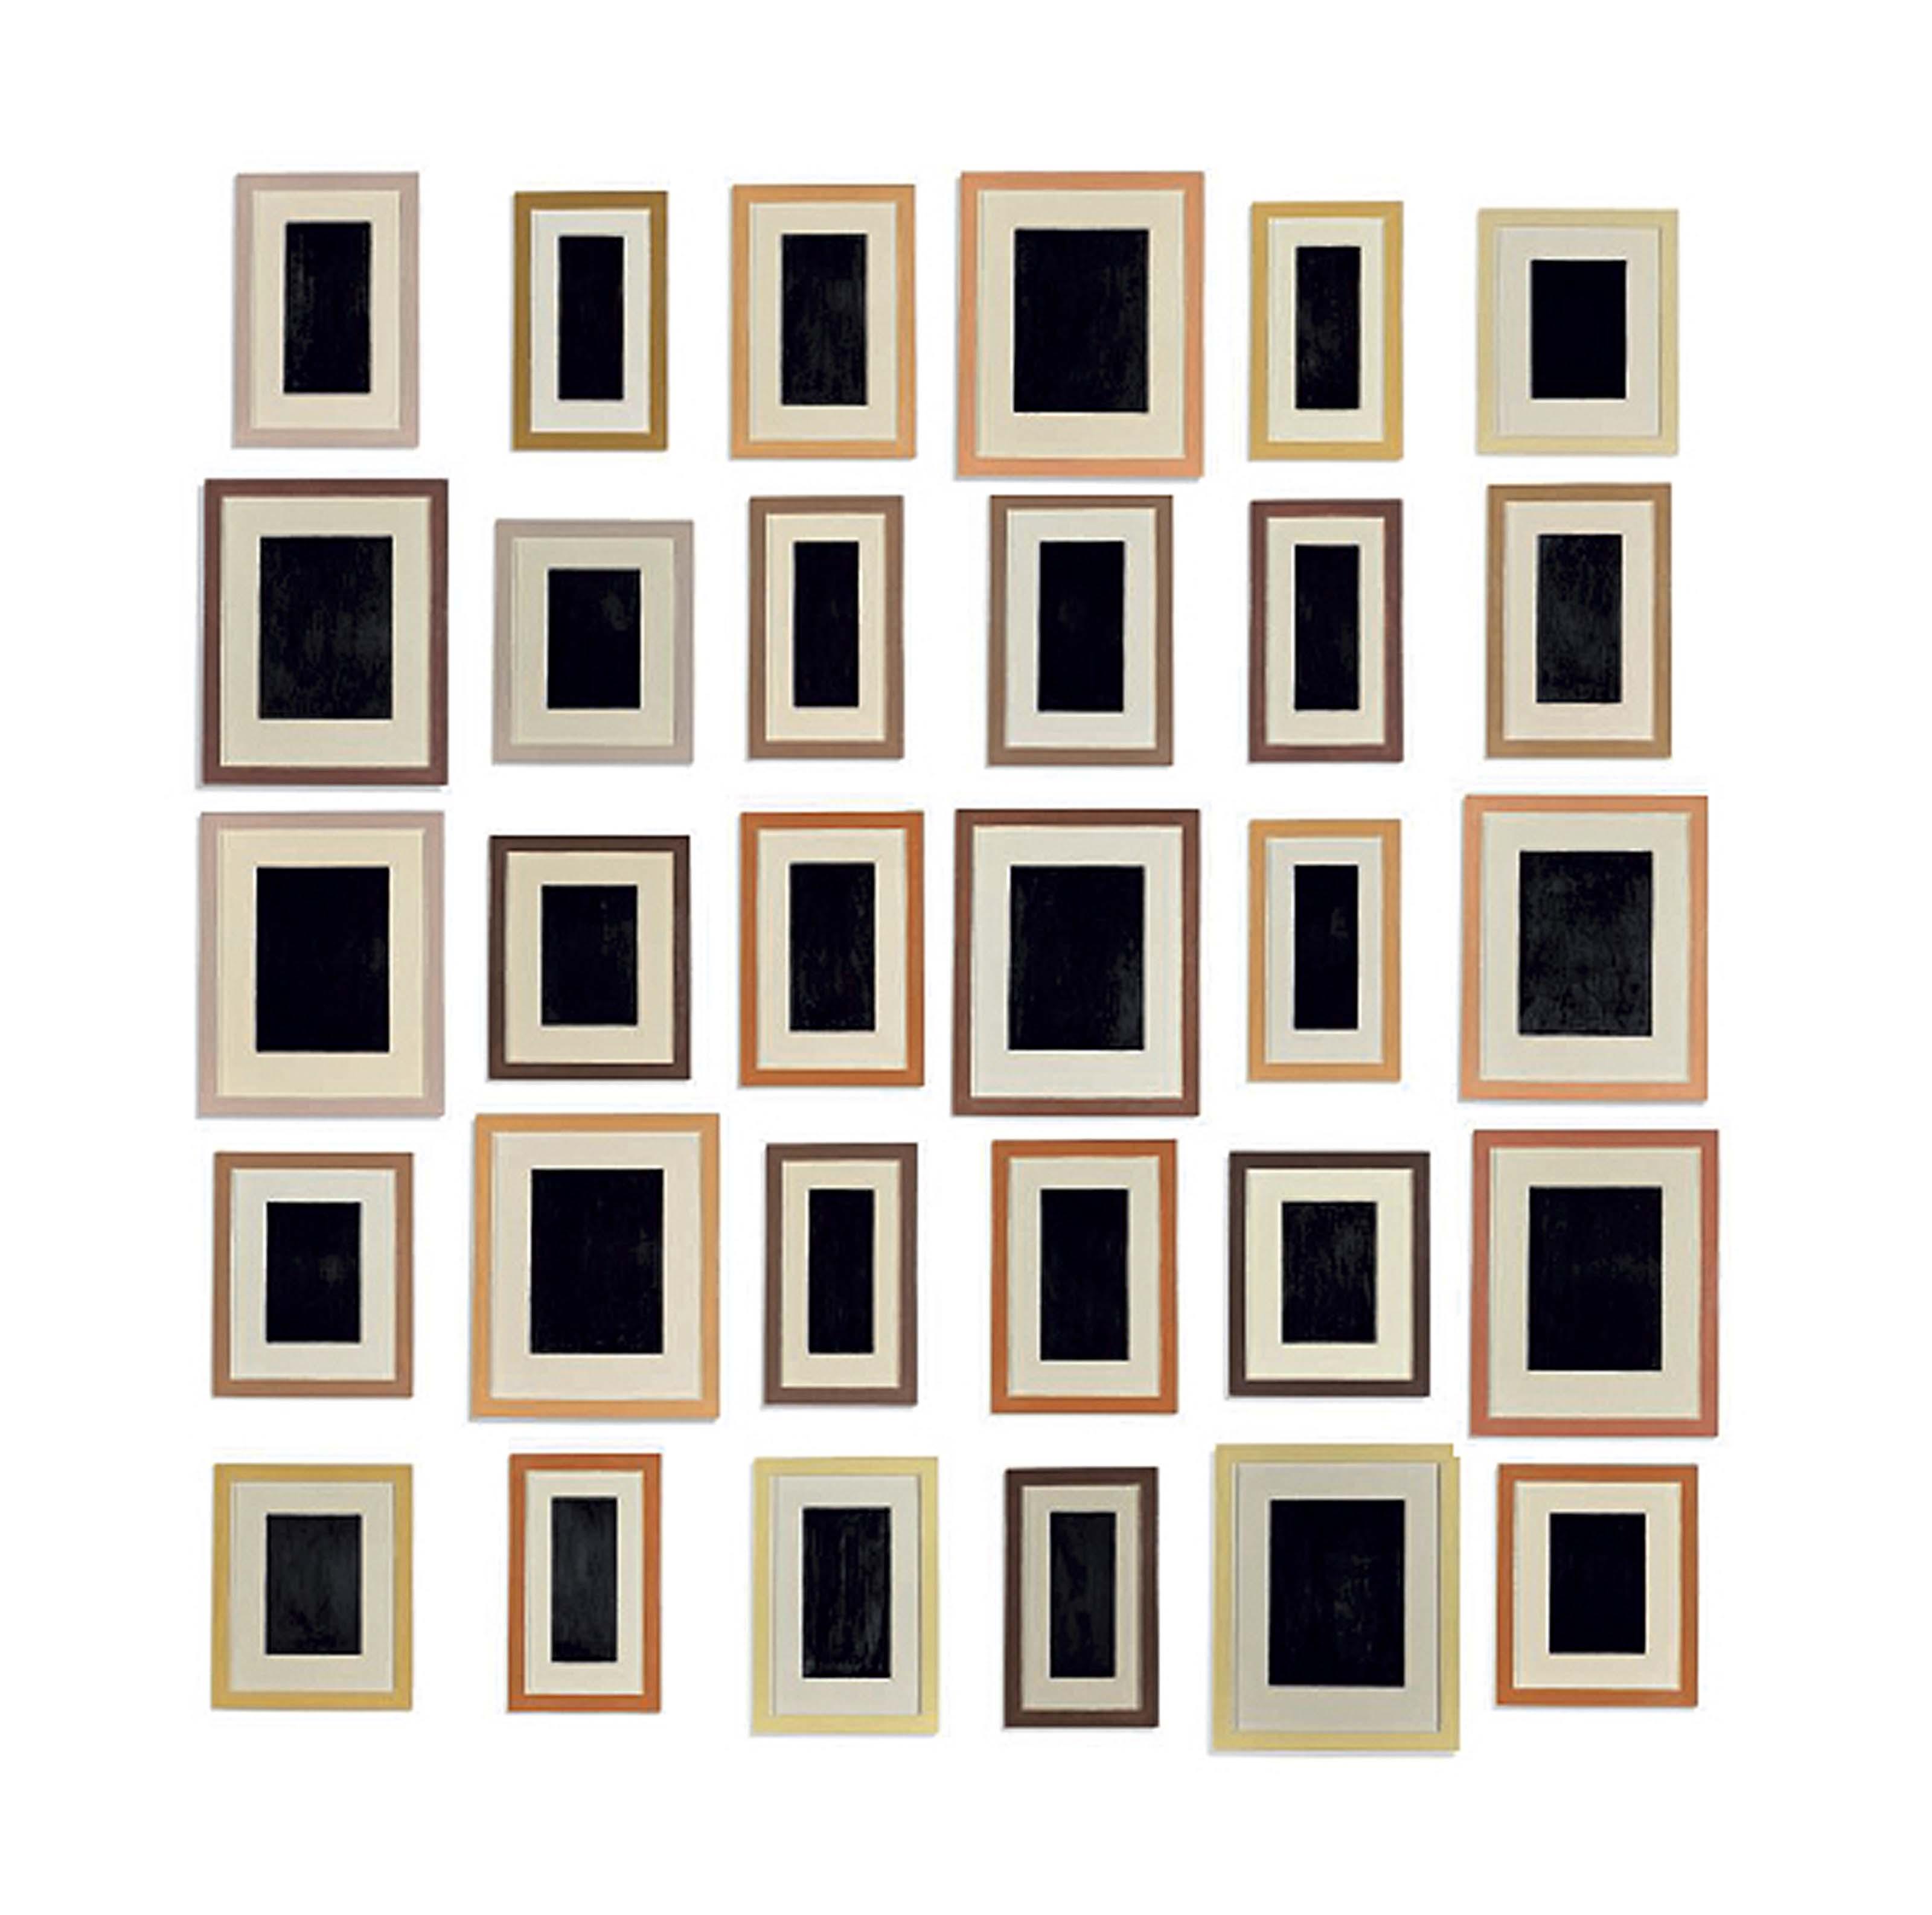 30 Plaster Surrogates 1990